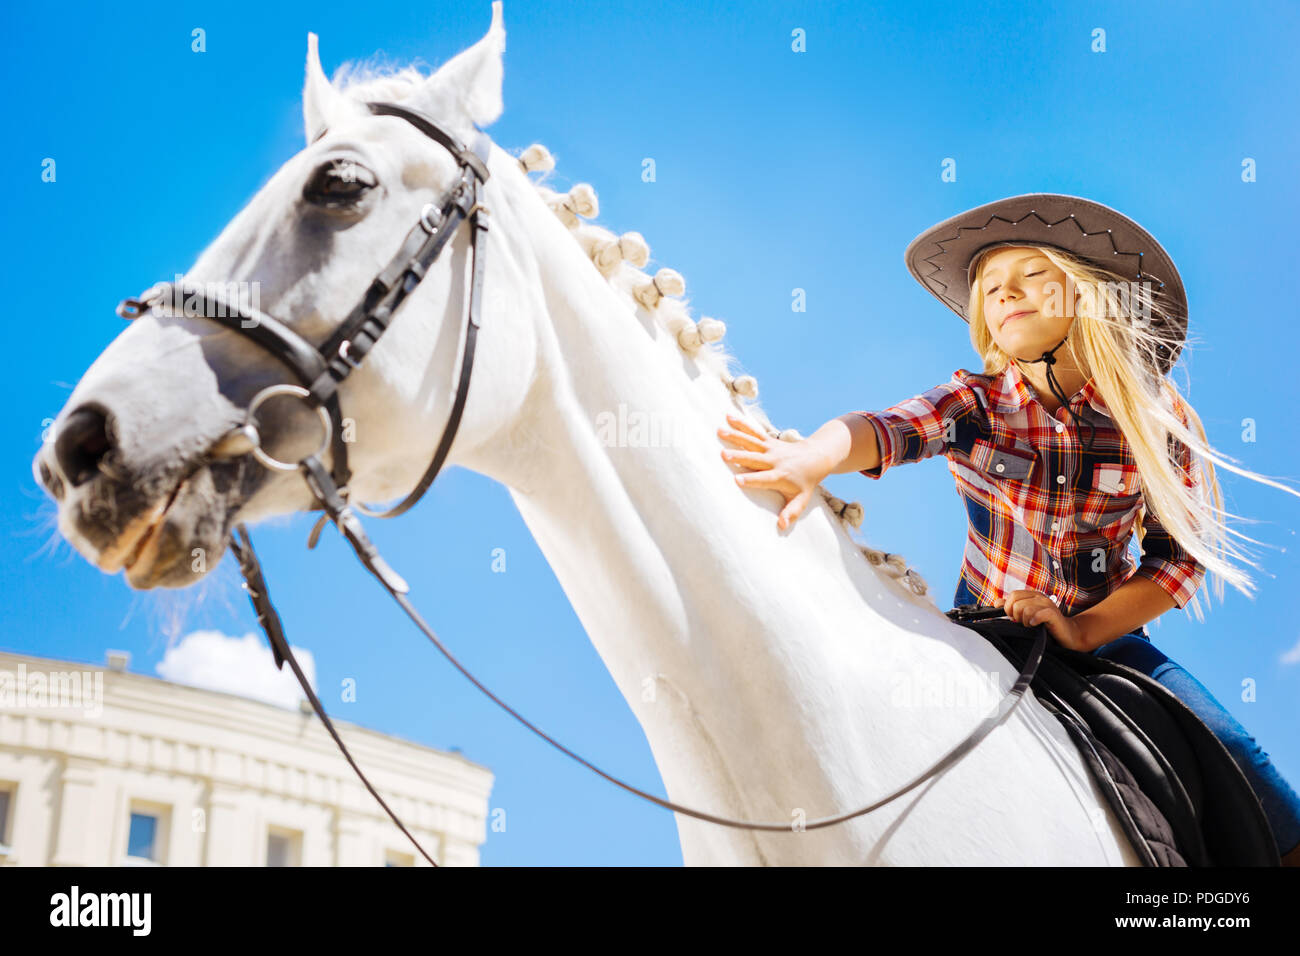 Blonde-haired schoolgirl loving her hobby while sitting on horse - Stock Image